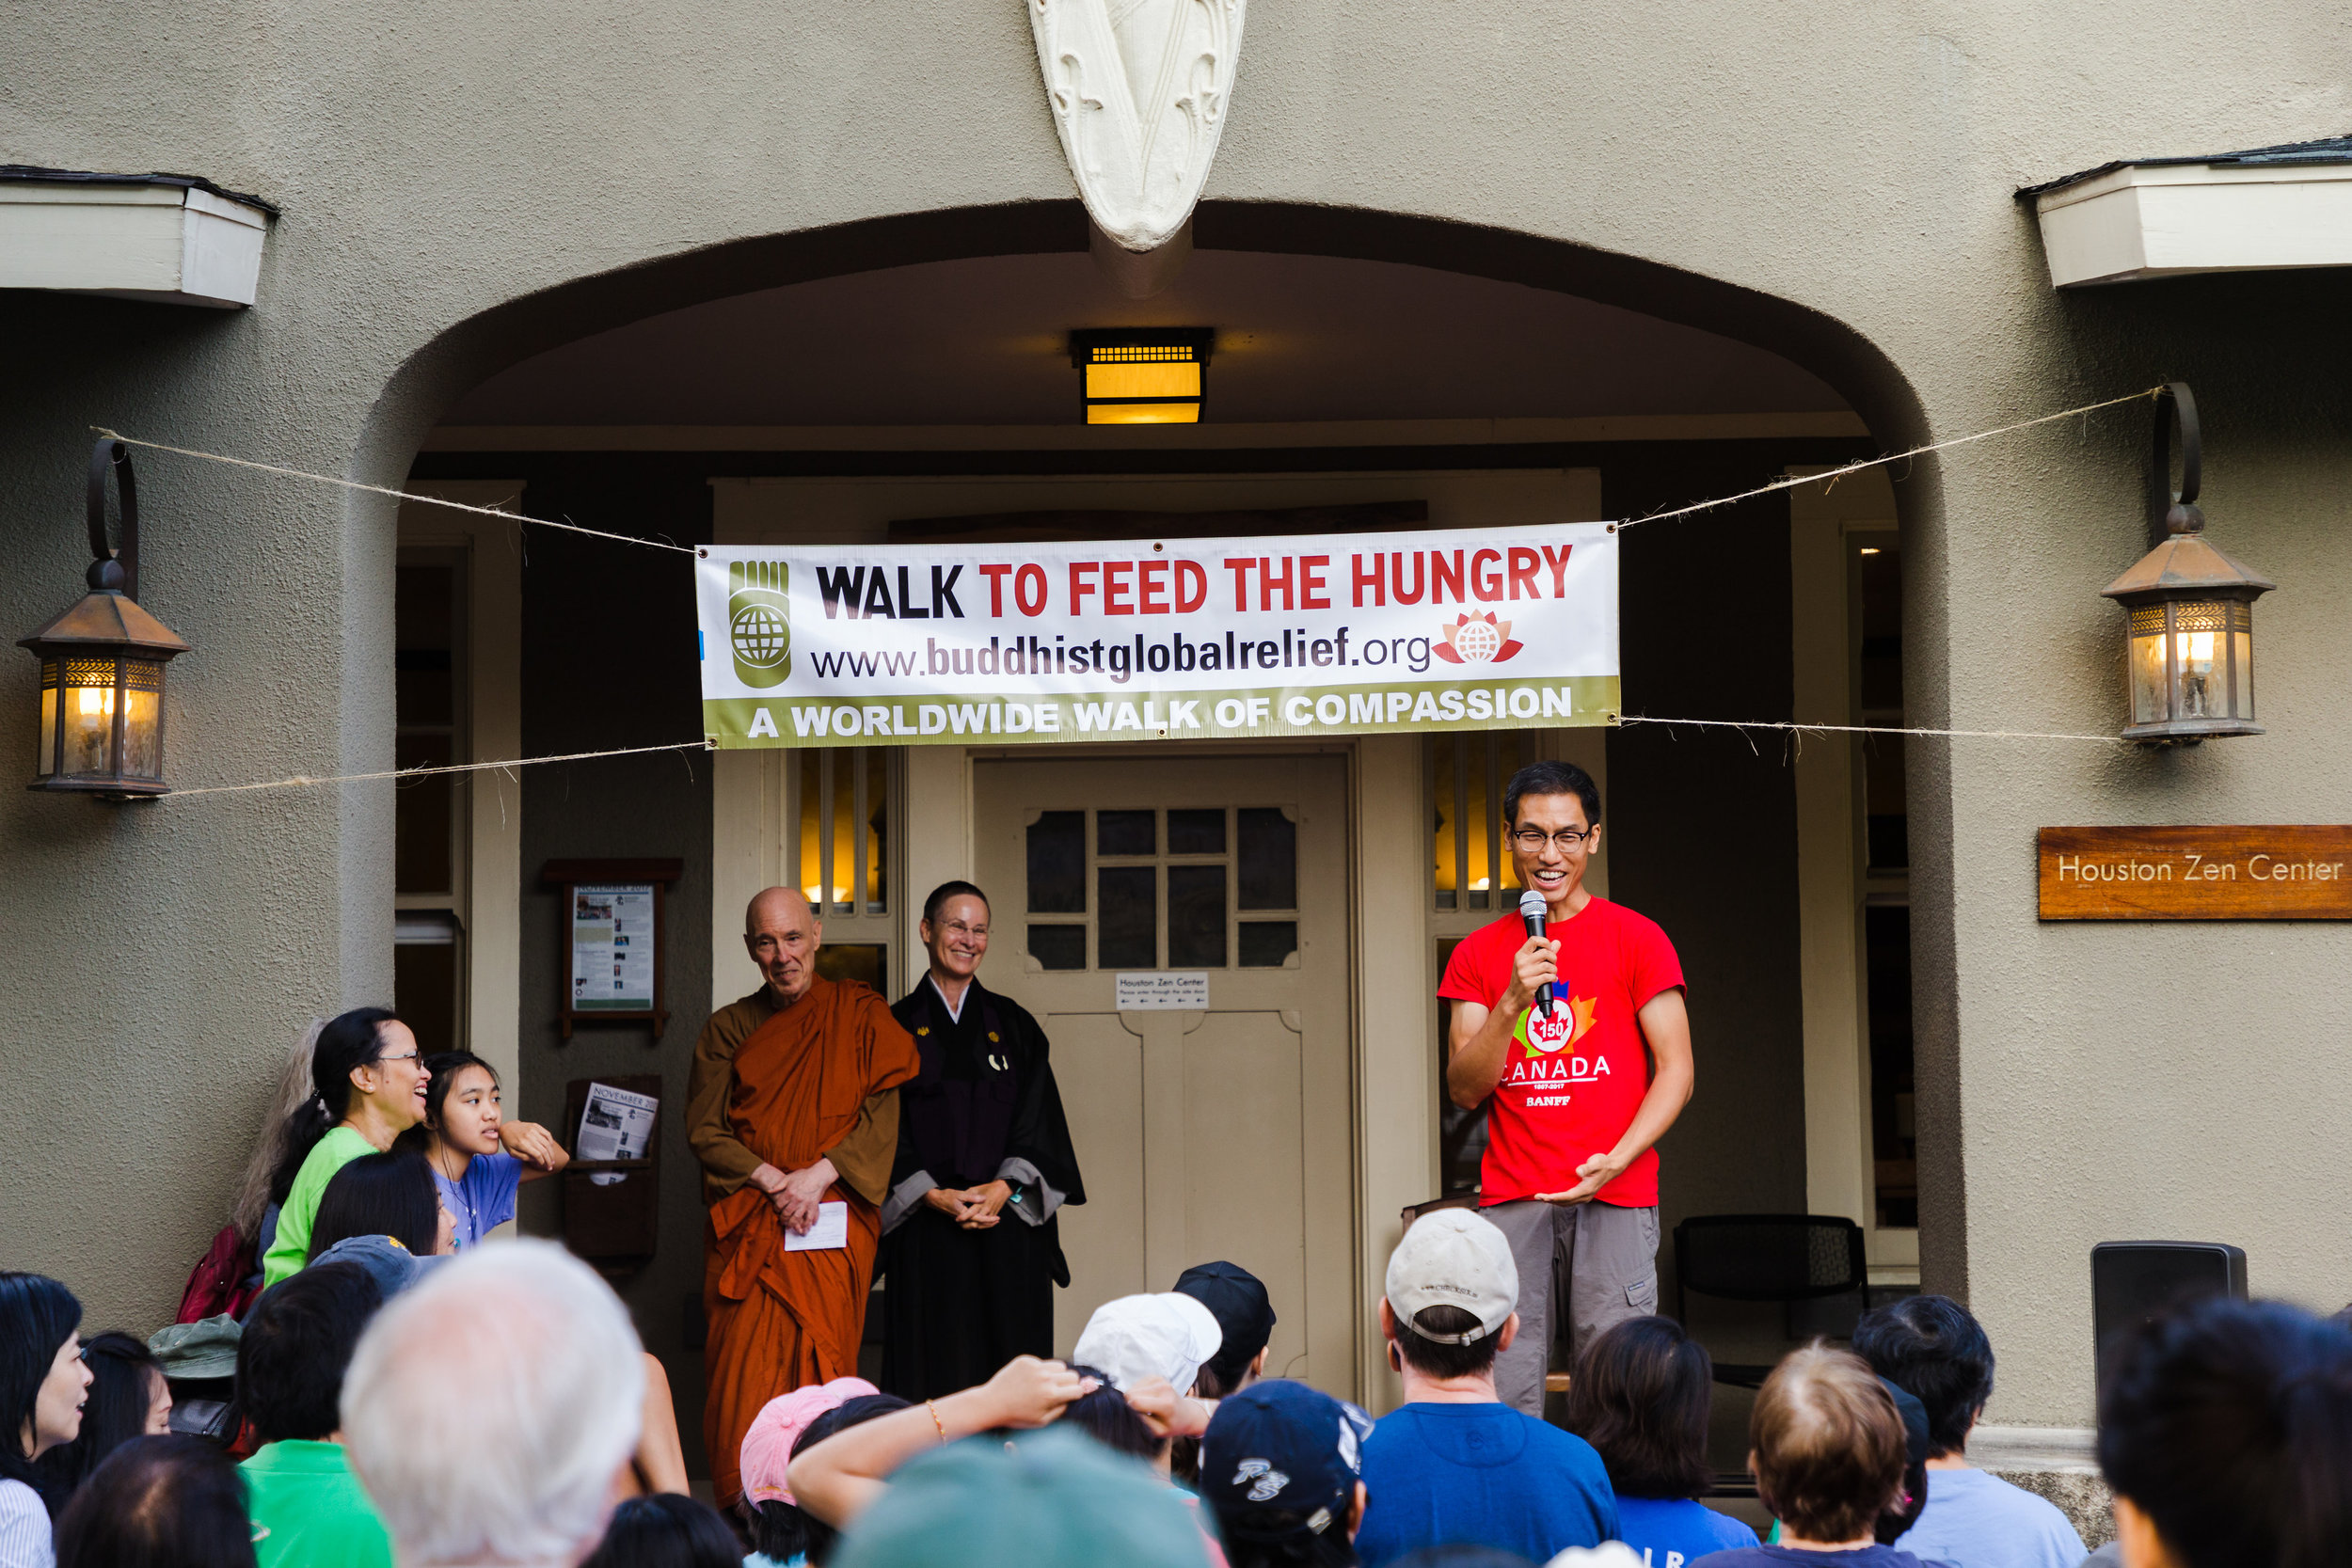 Bhikkhu-Bodhi-Global-Relief-Houston-Zen-Walk-20.jpg